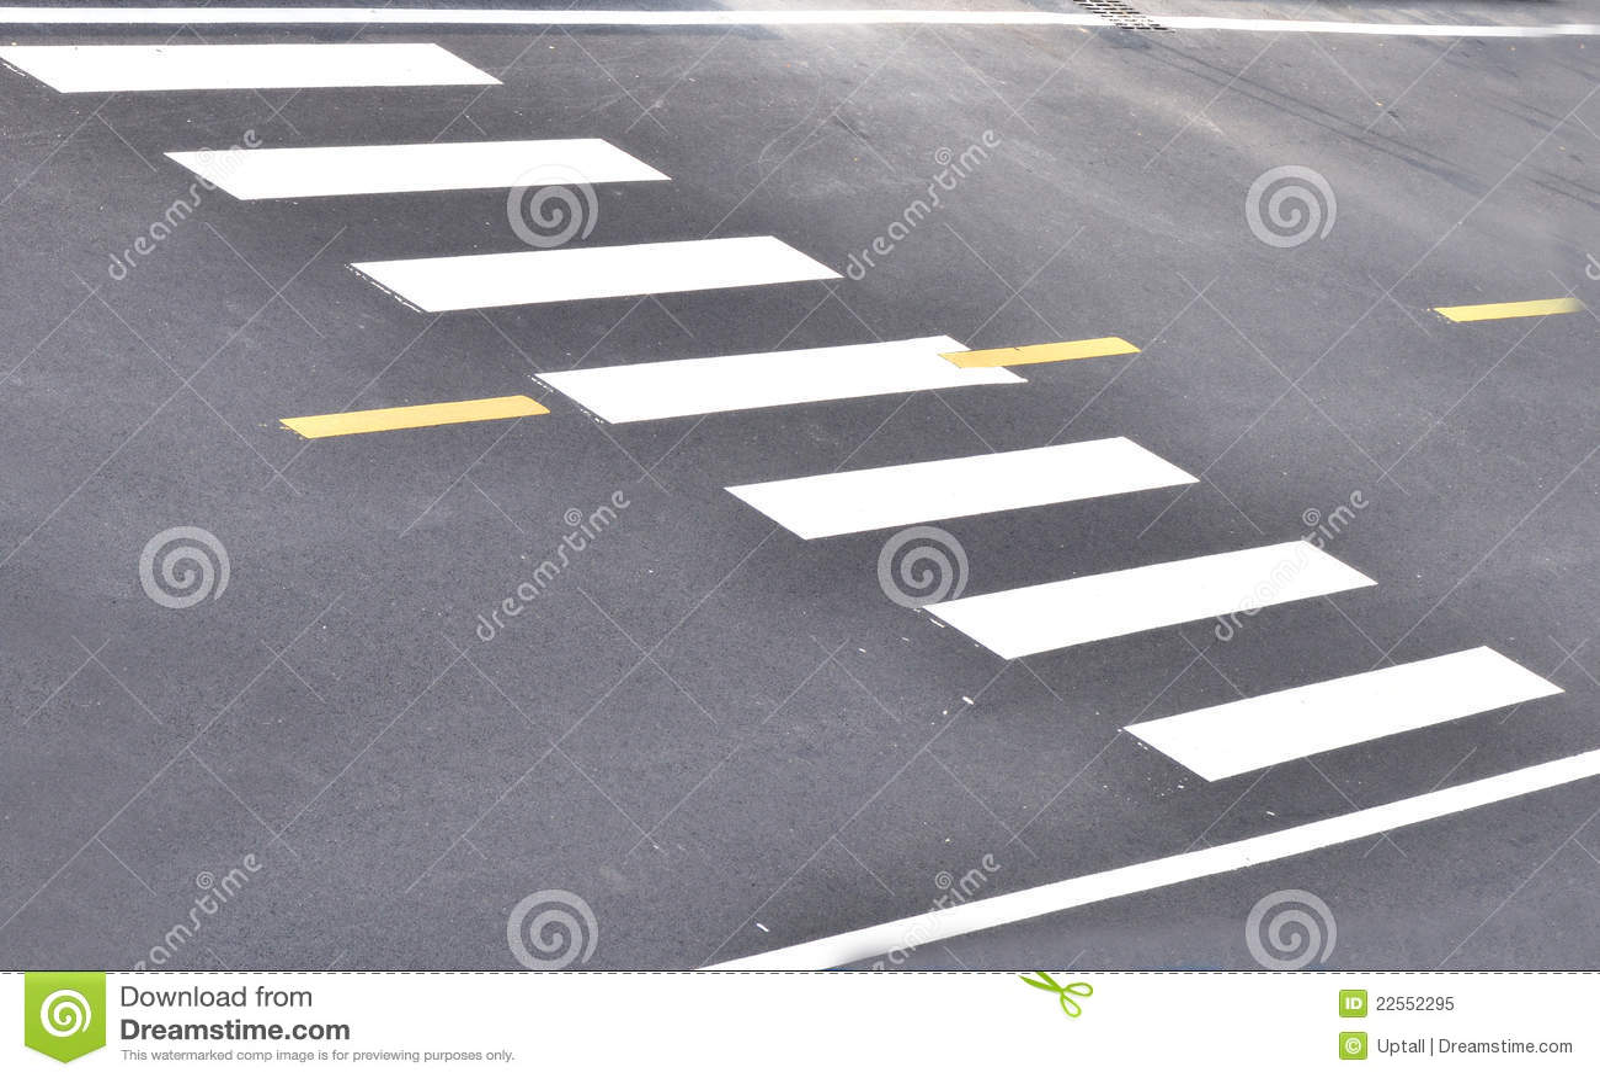 Along (prep) direction - m